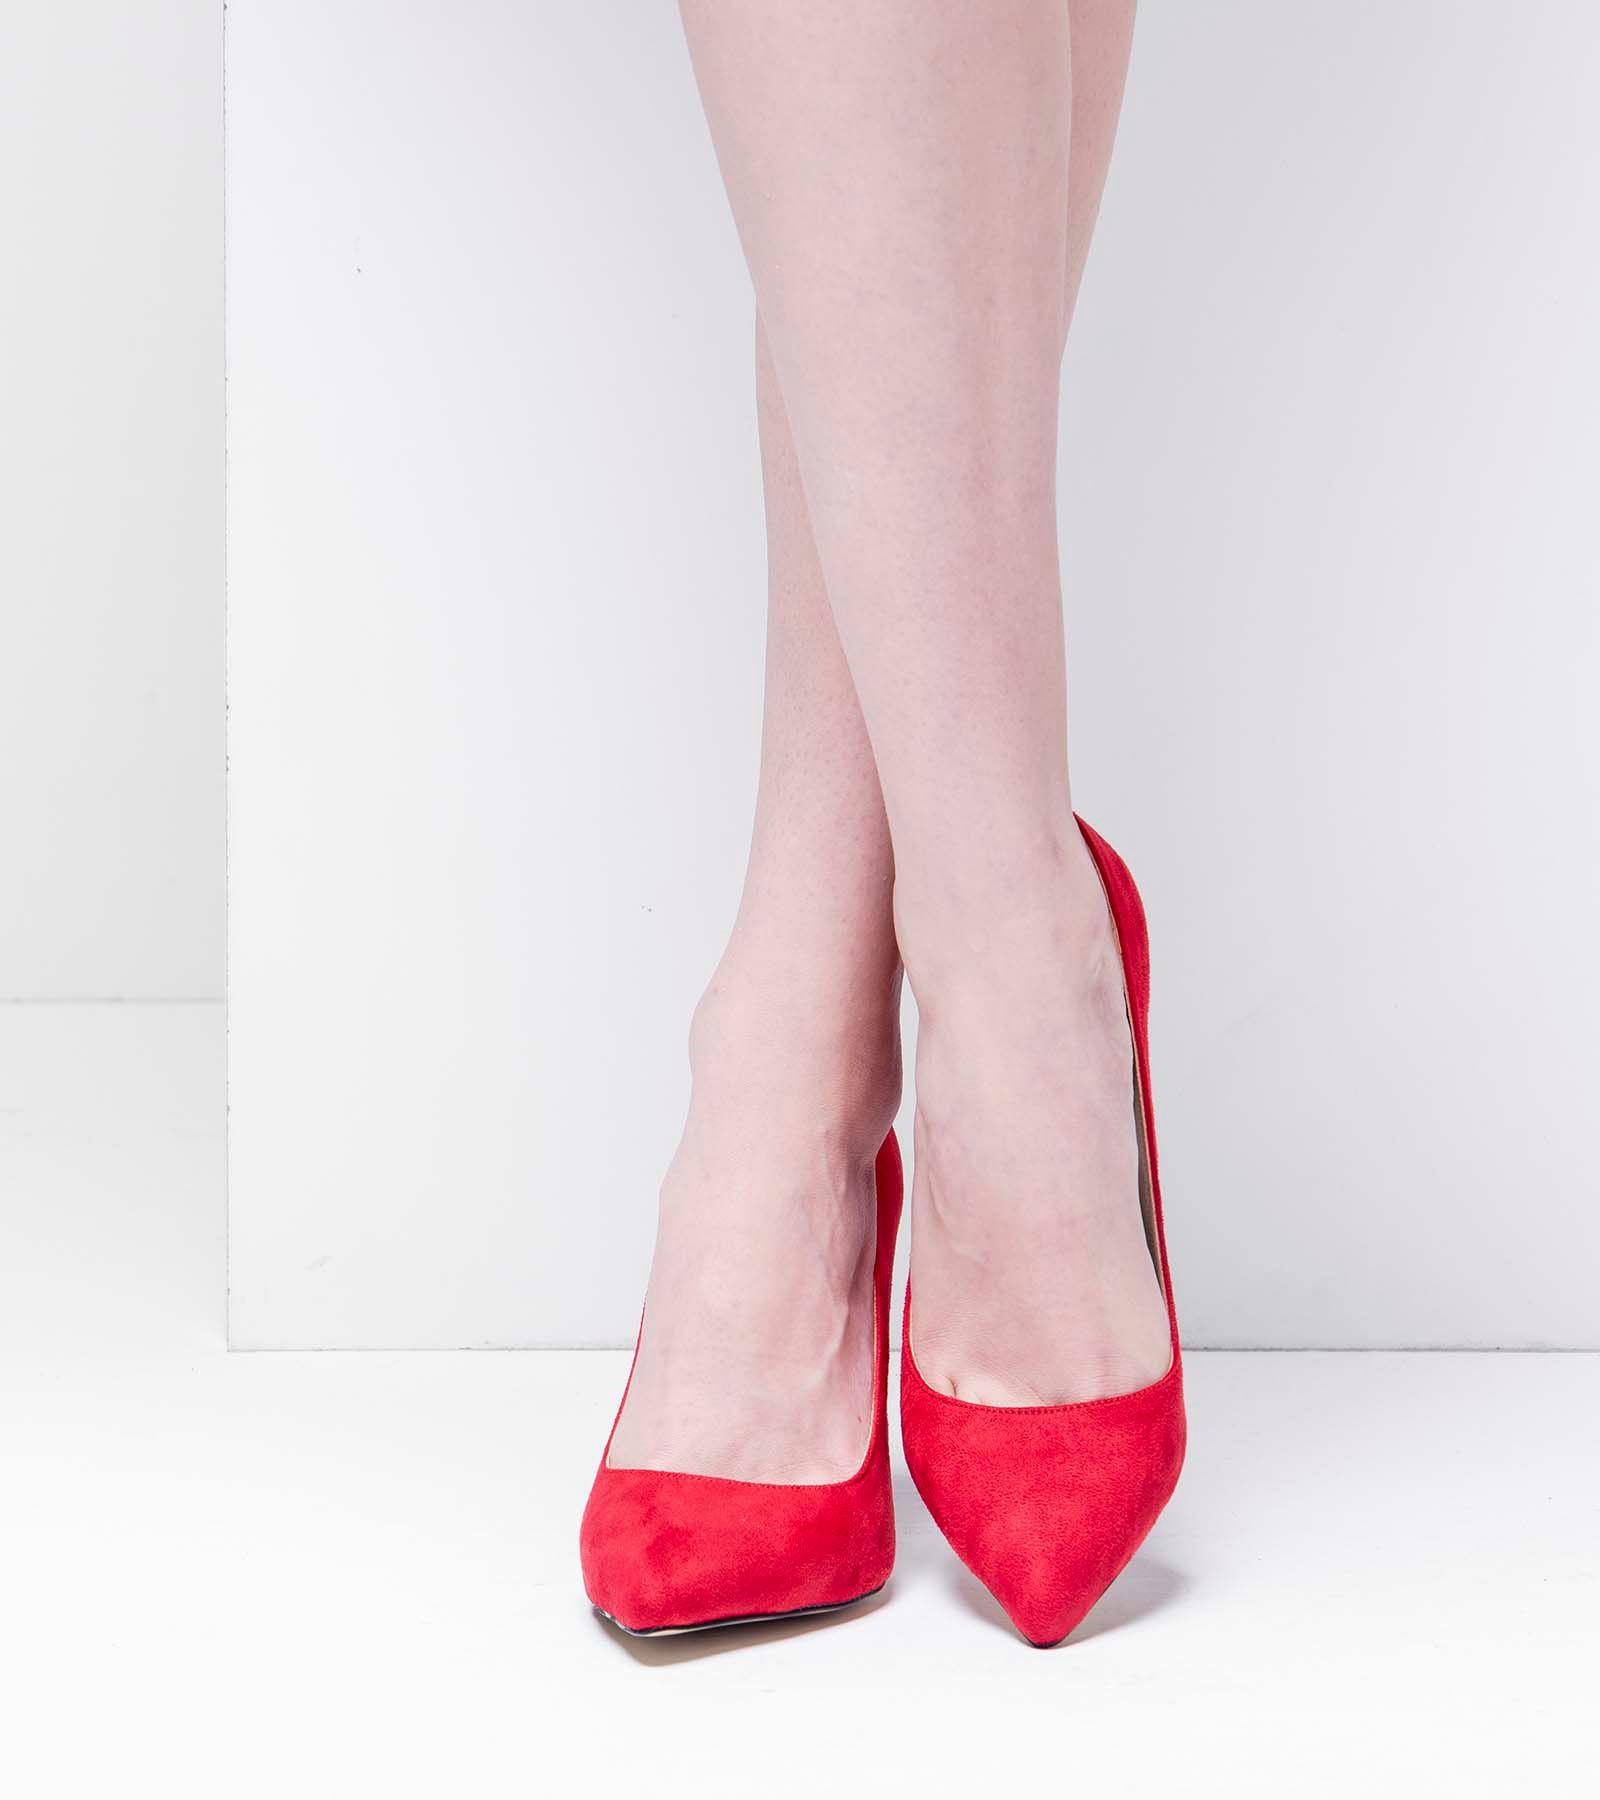 Carolina İnce Topuk Süet Stiletto Kırmızı